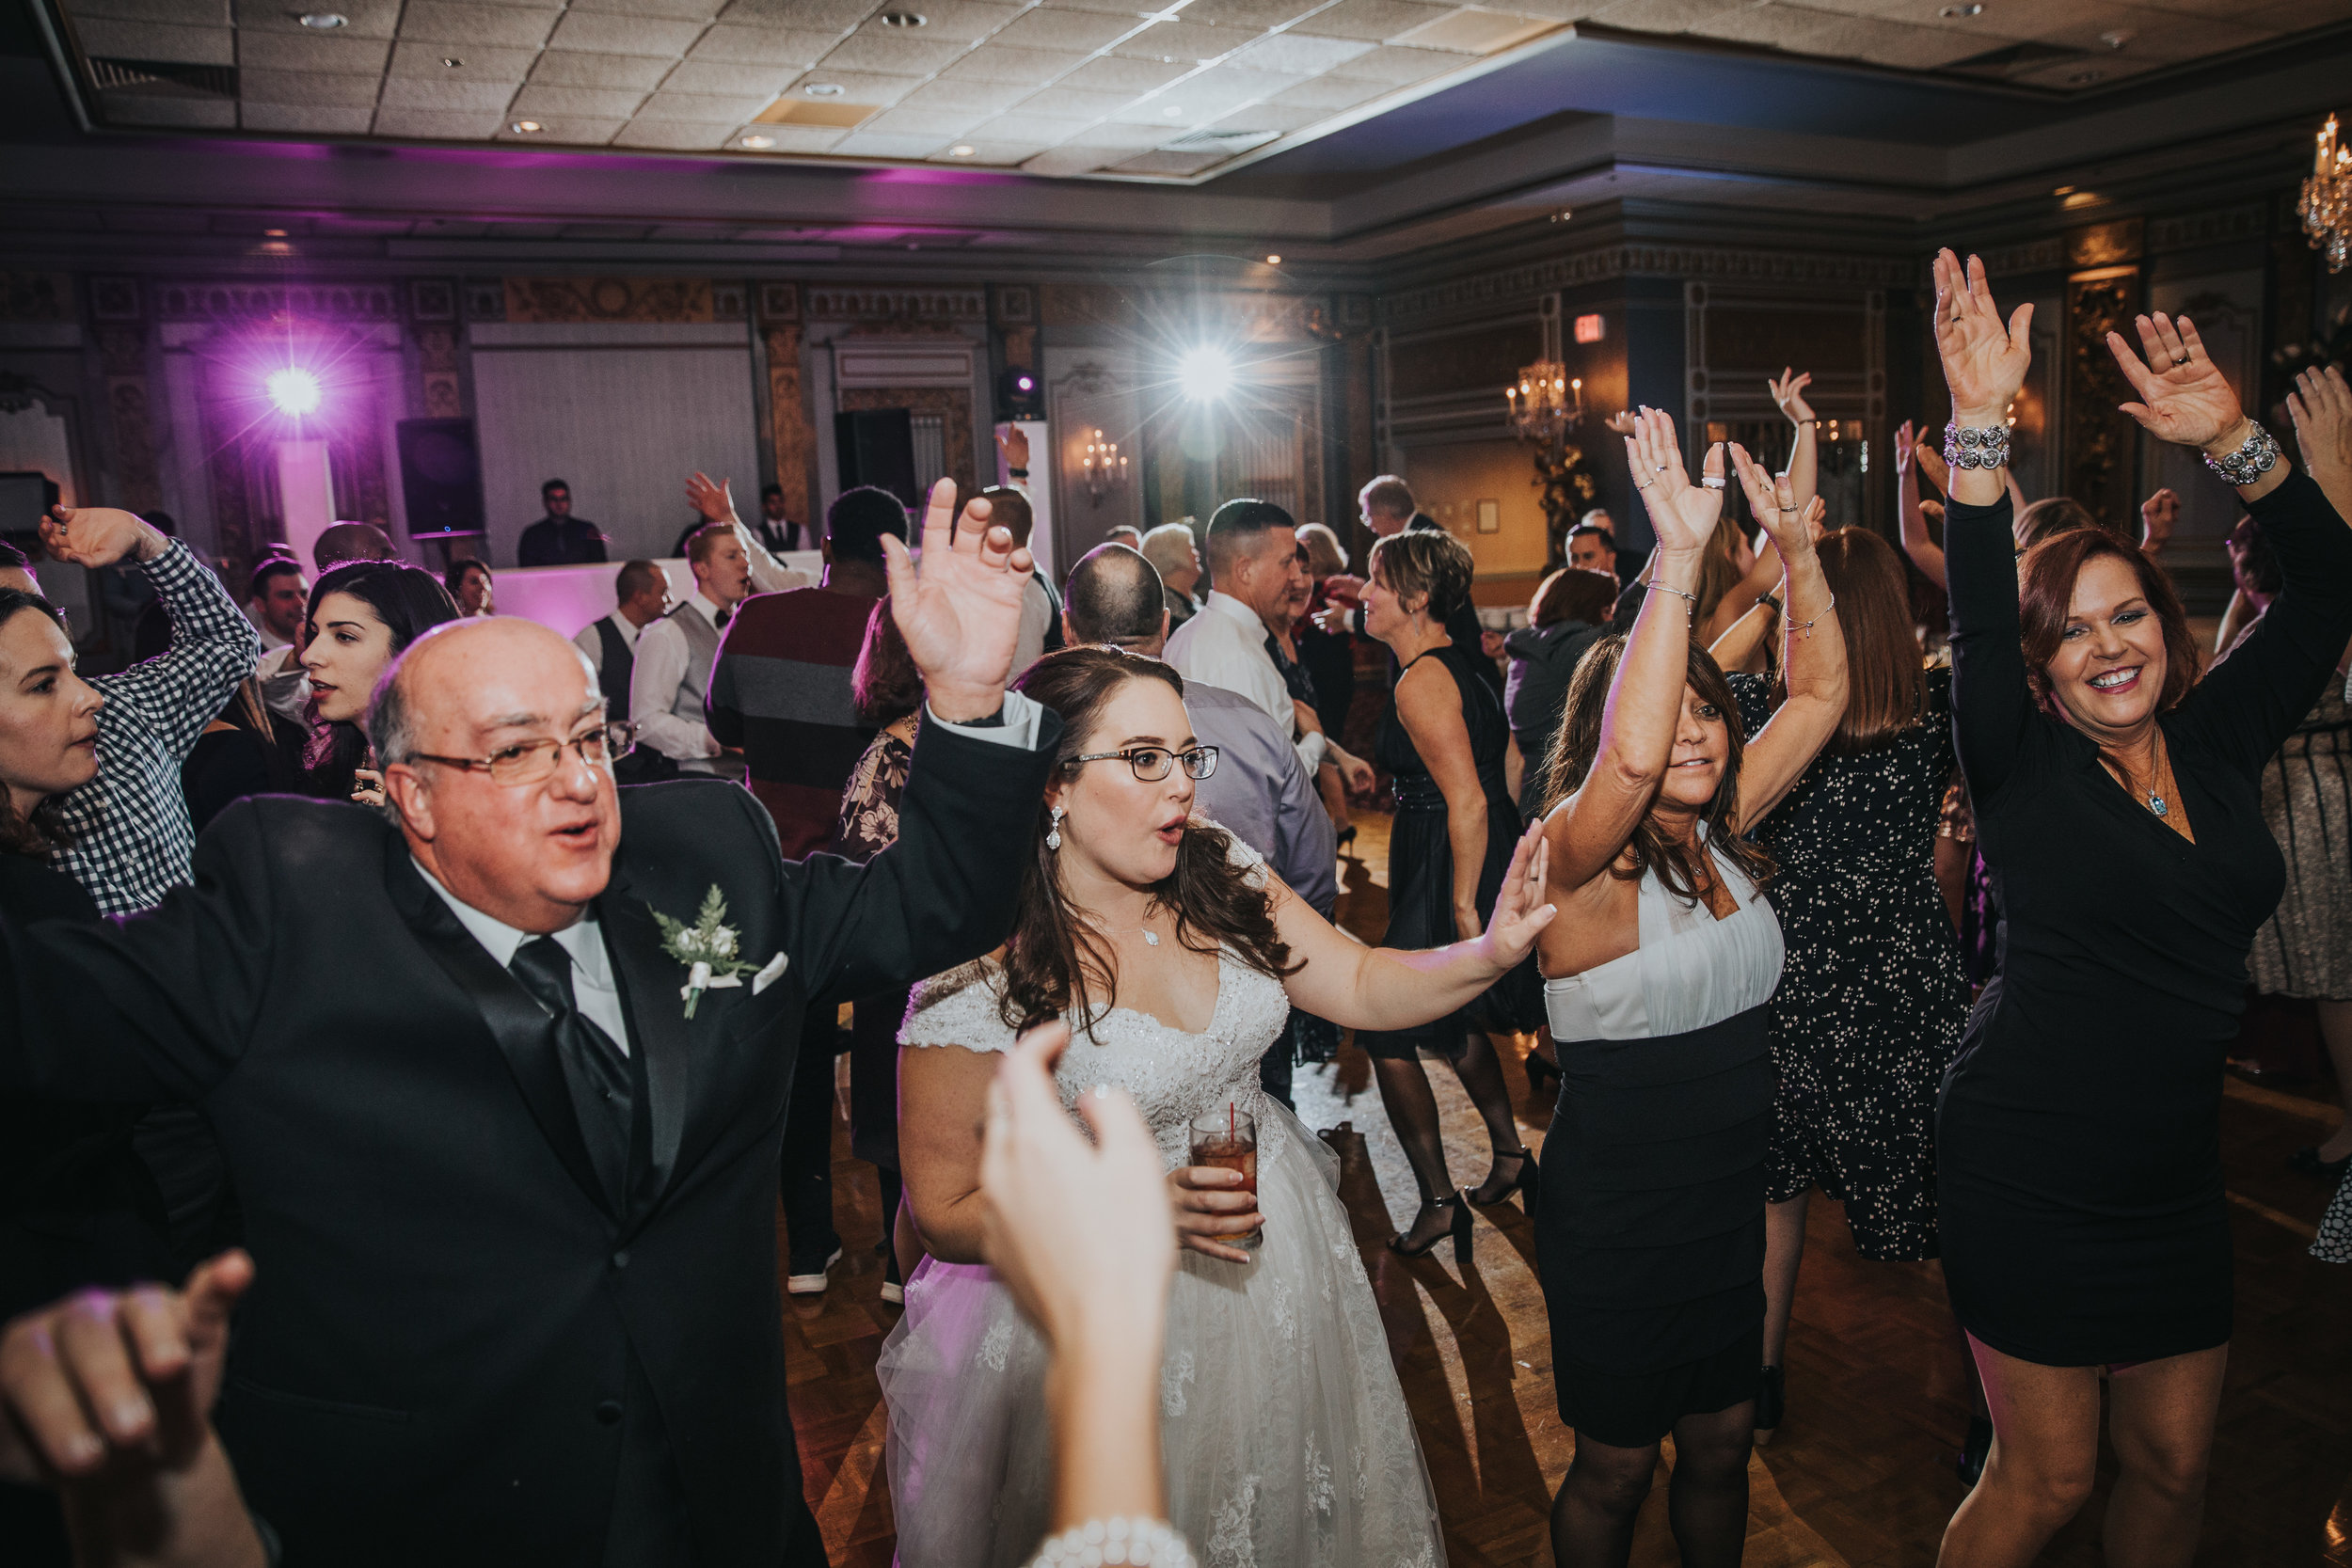 New-Jersey-Wedding-Photography-Fishers-Tudor-House-JennaLynnPhotography-Reception-Kathleen&Eddie-172.jpg